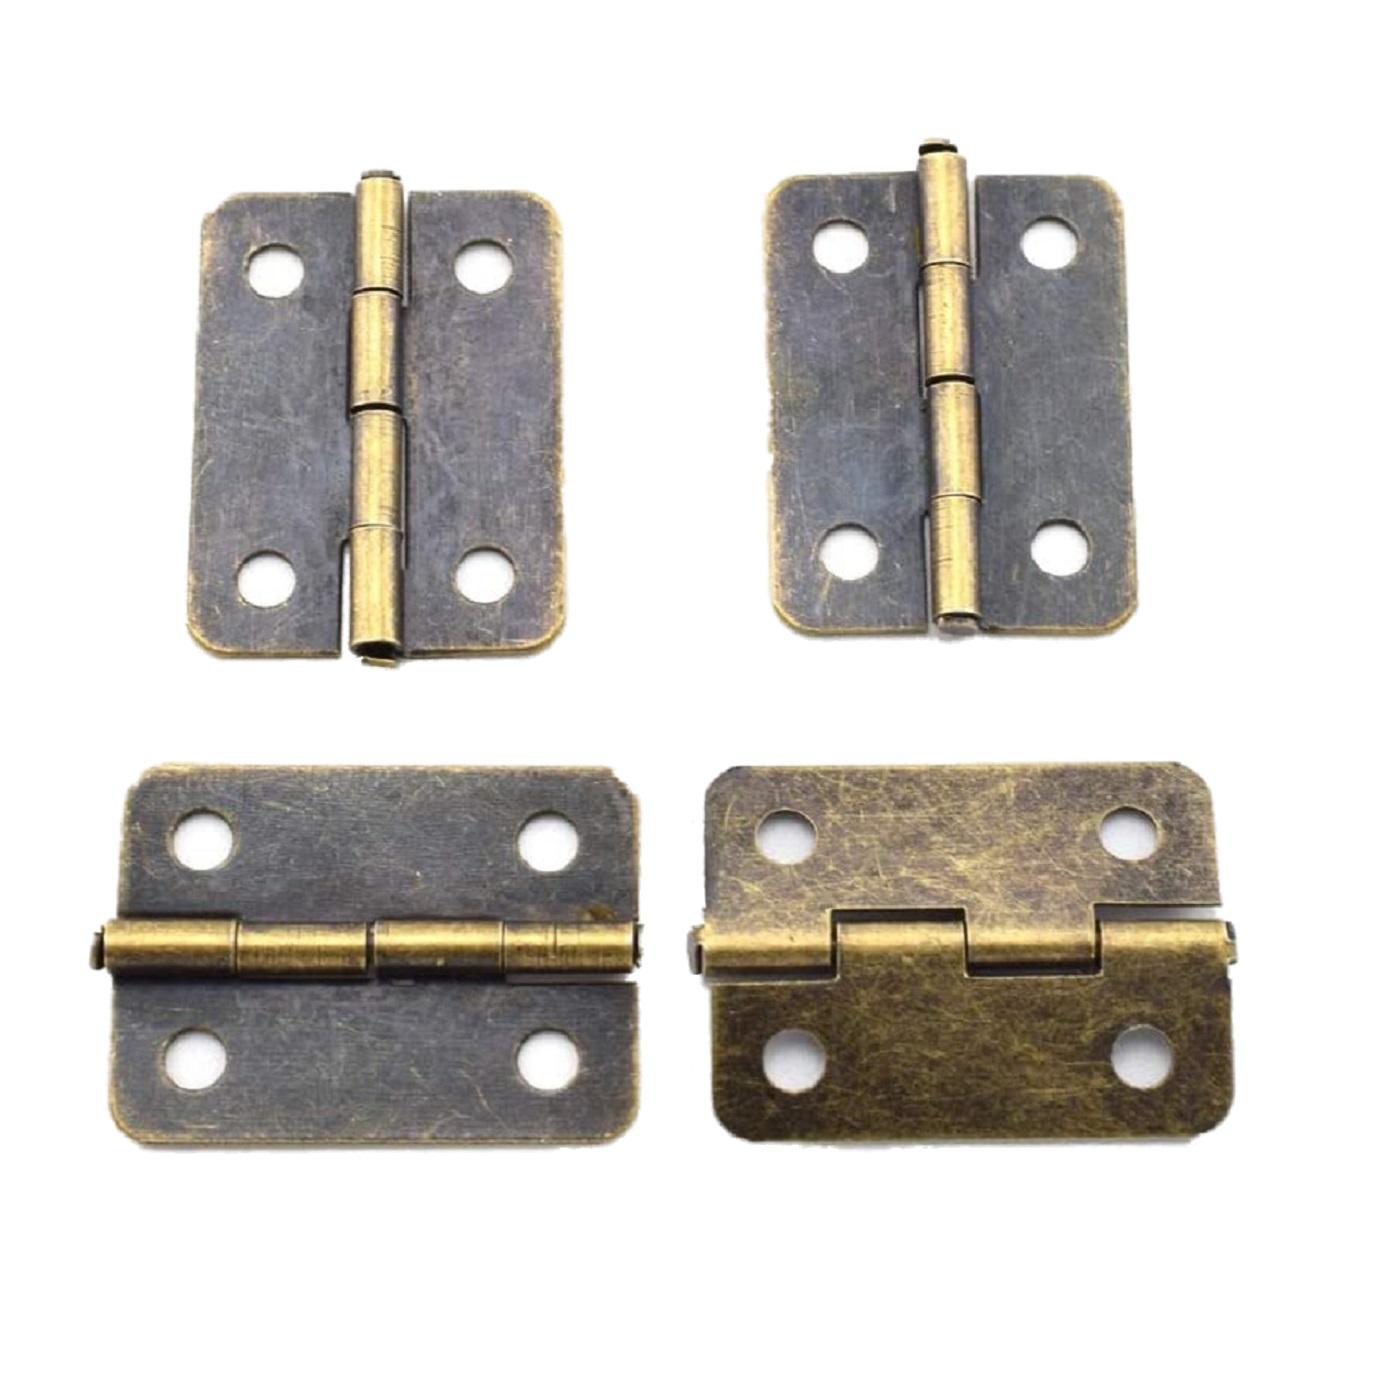 لولا مدل DPR4مجموعه 4 عددی